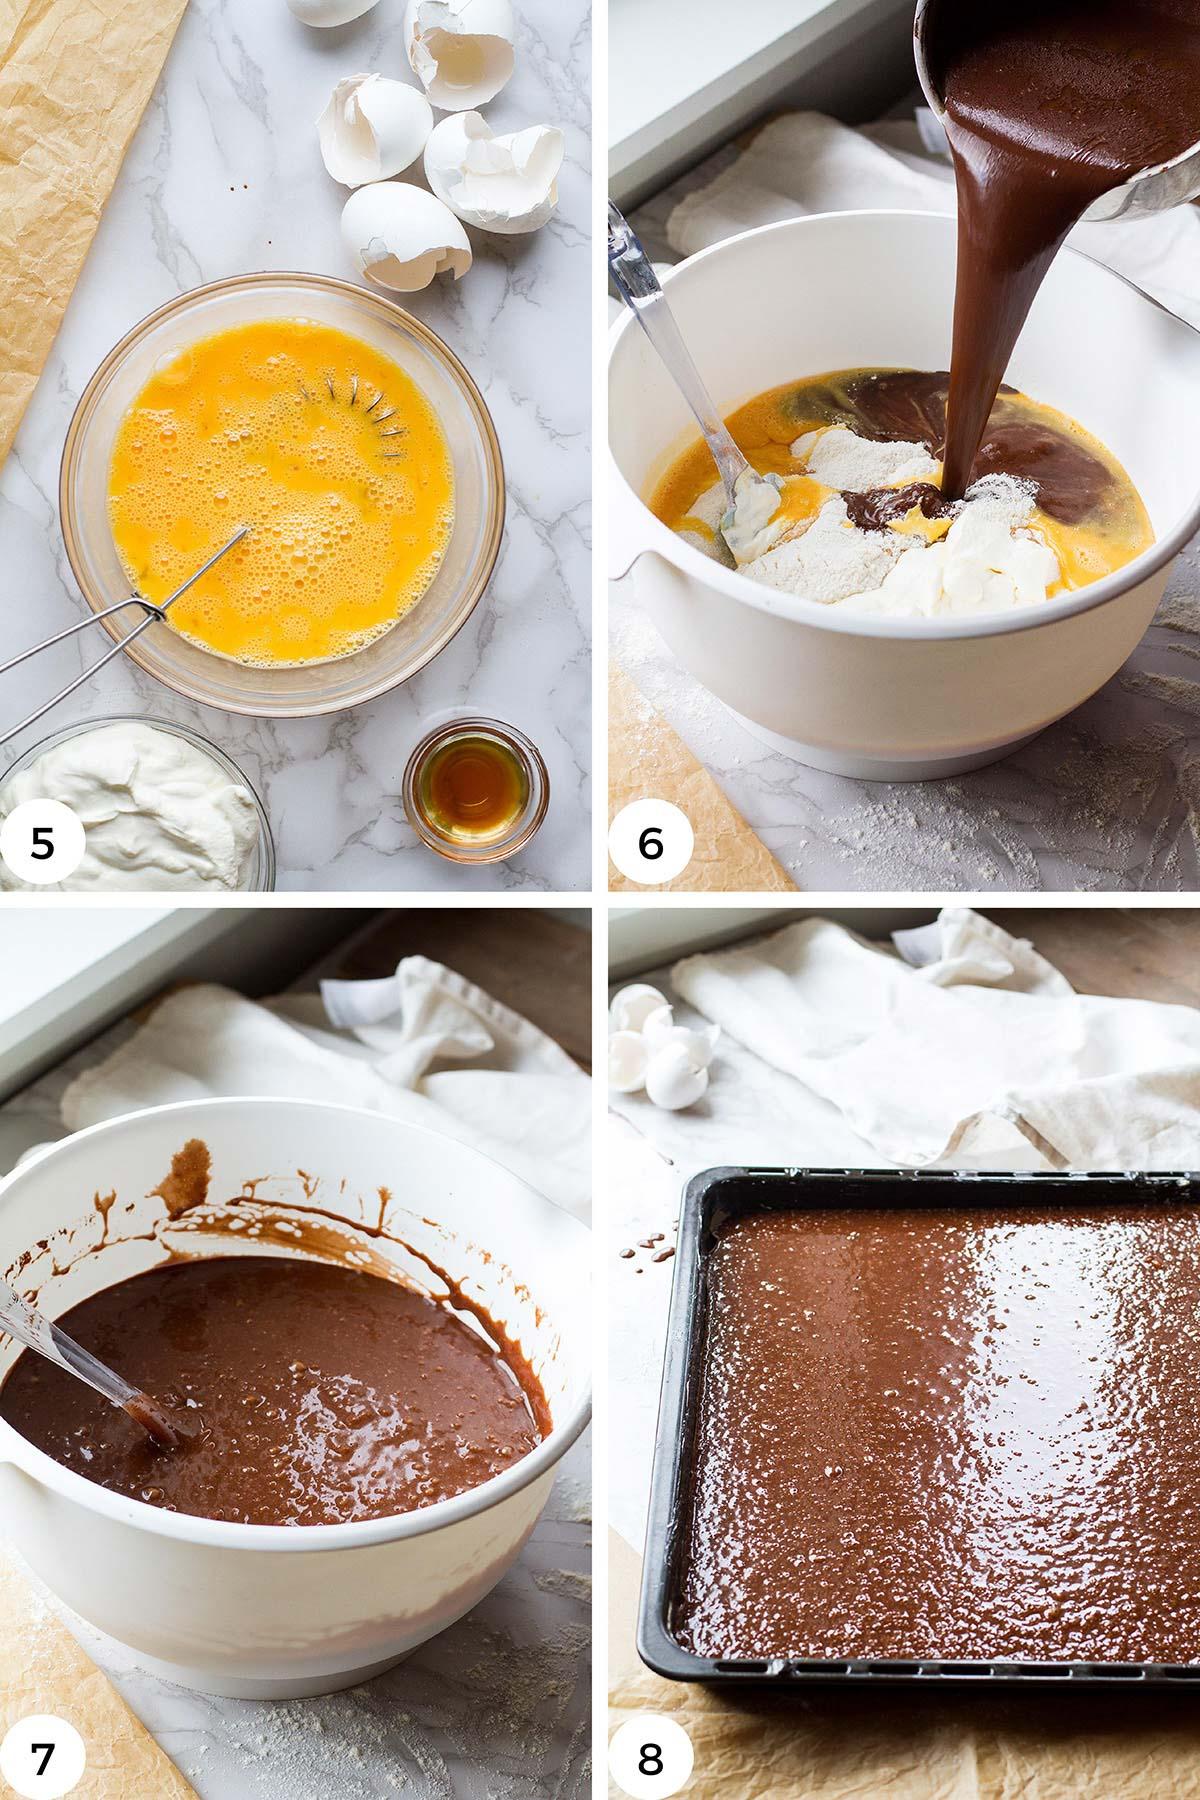 Steps to make chocolate cake batter.